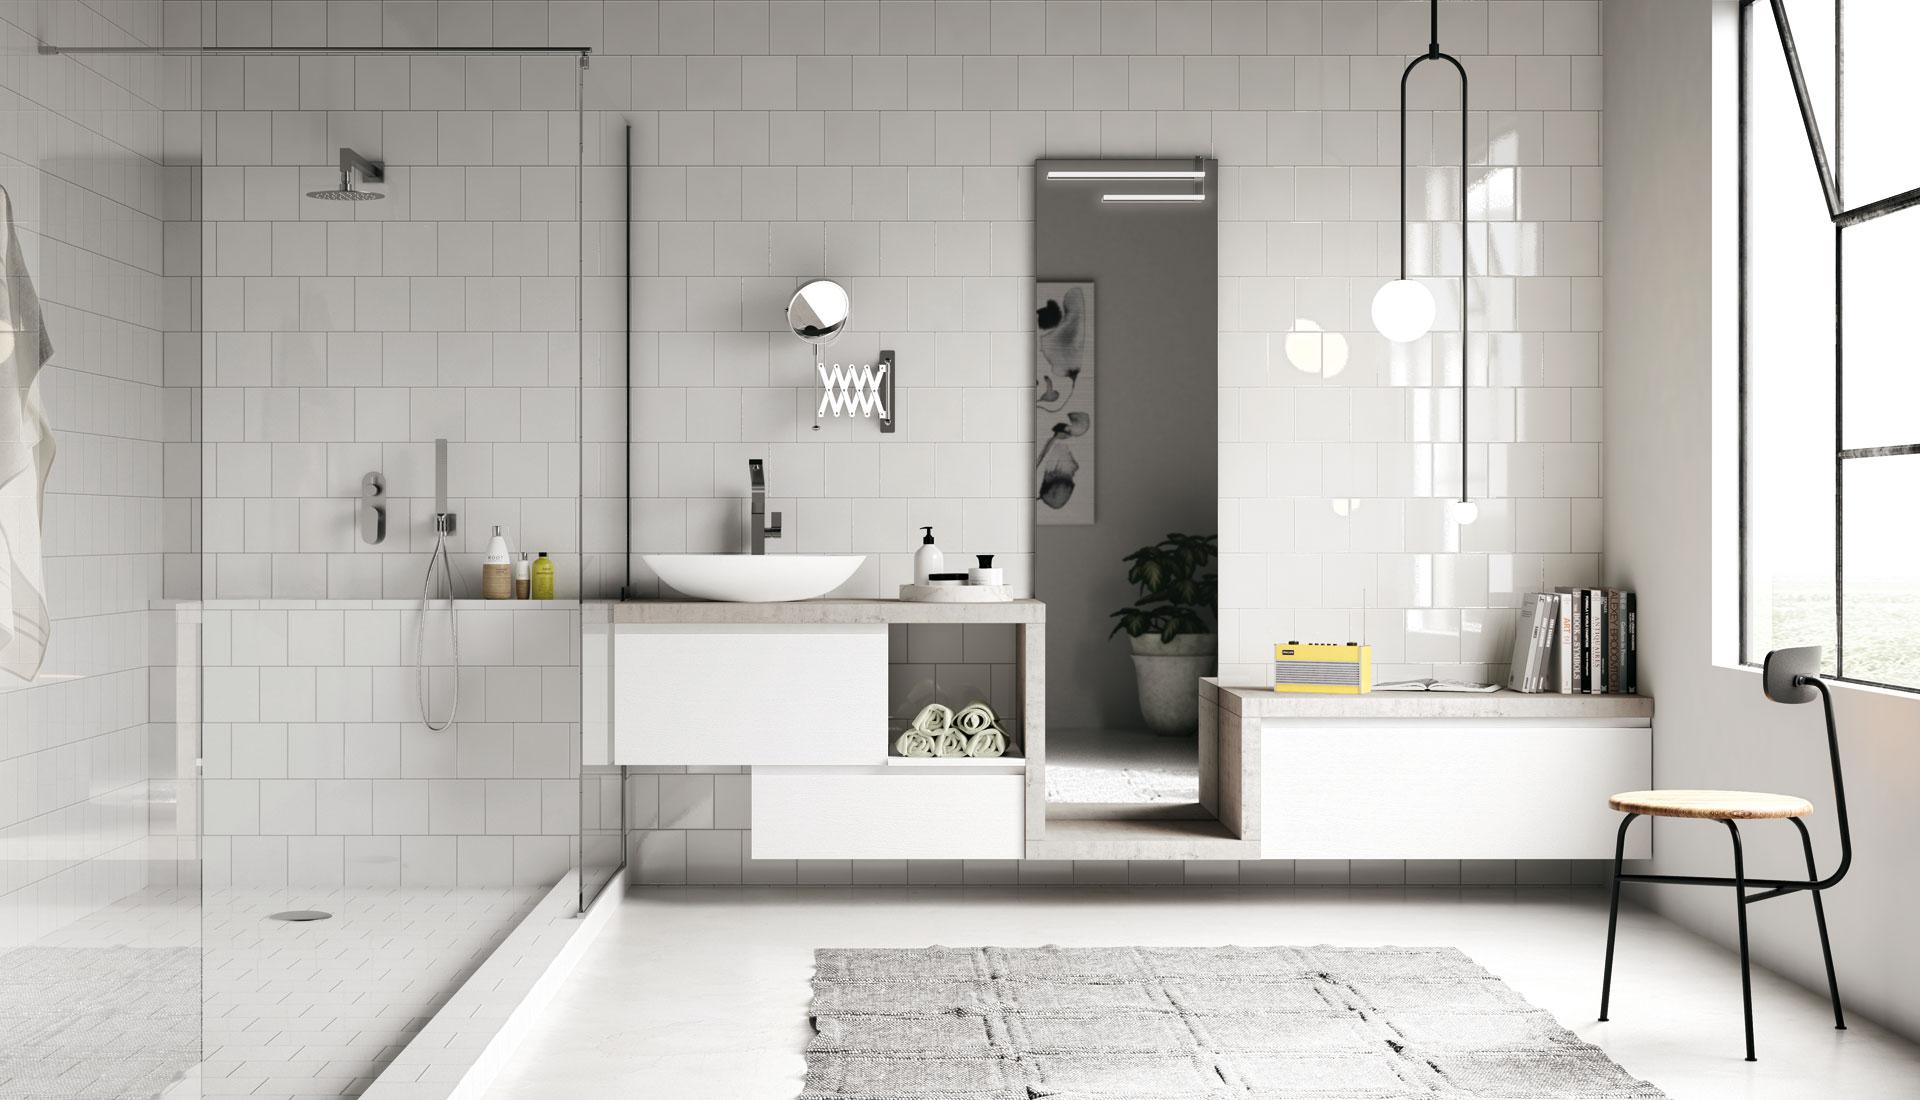 Handleless bathroom furniture puntotre arredobagno - Puntotre arredobagno ...